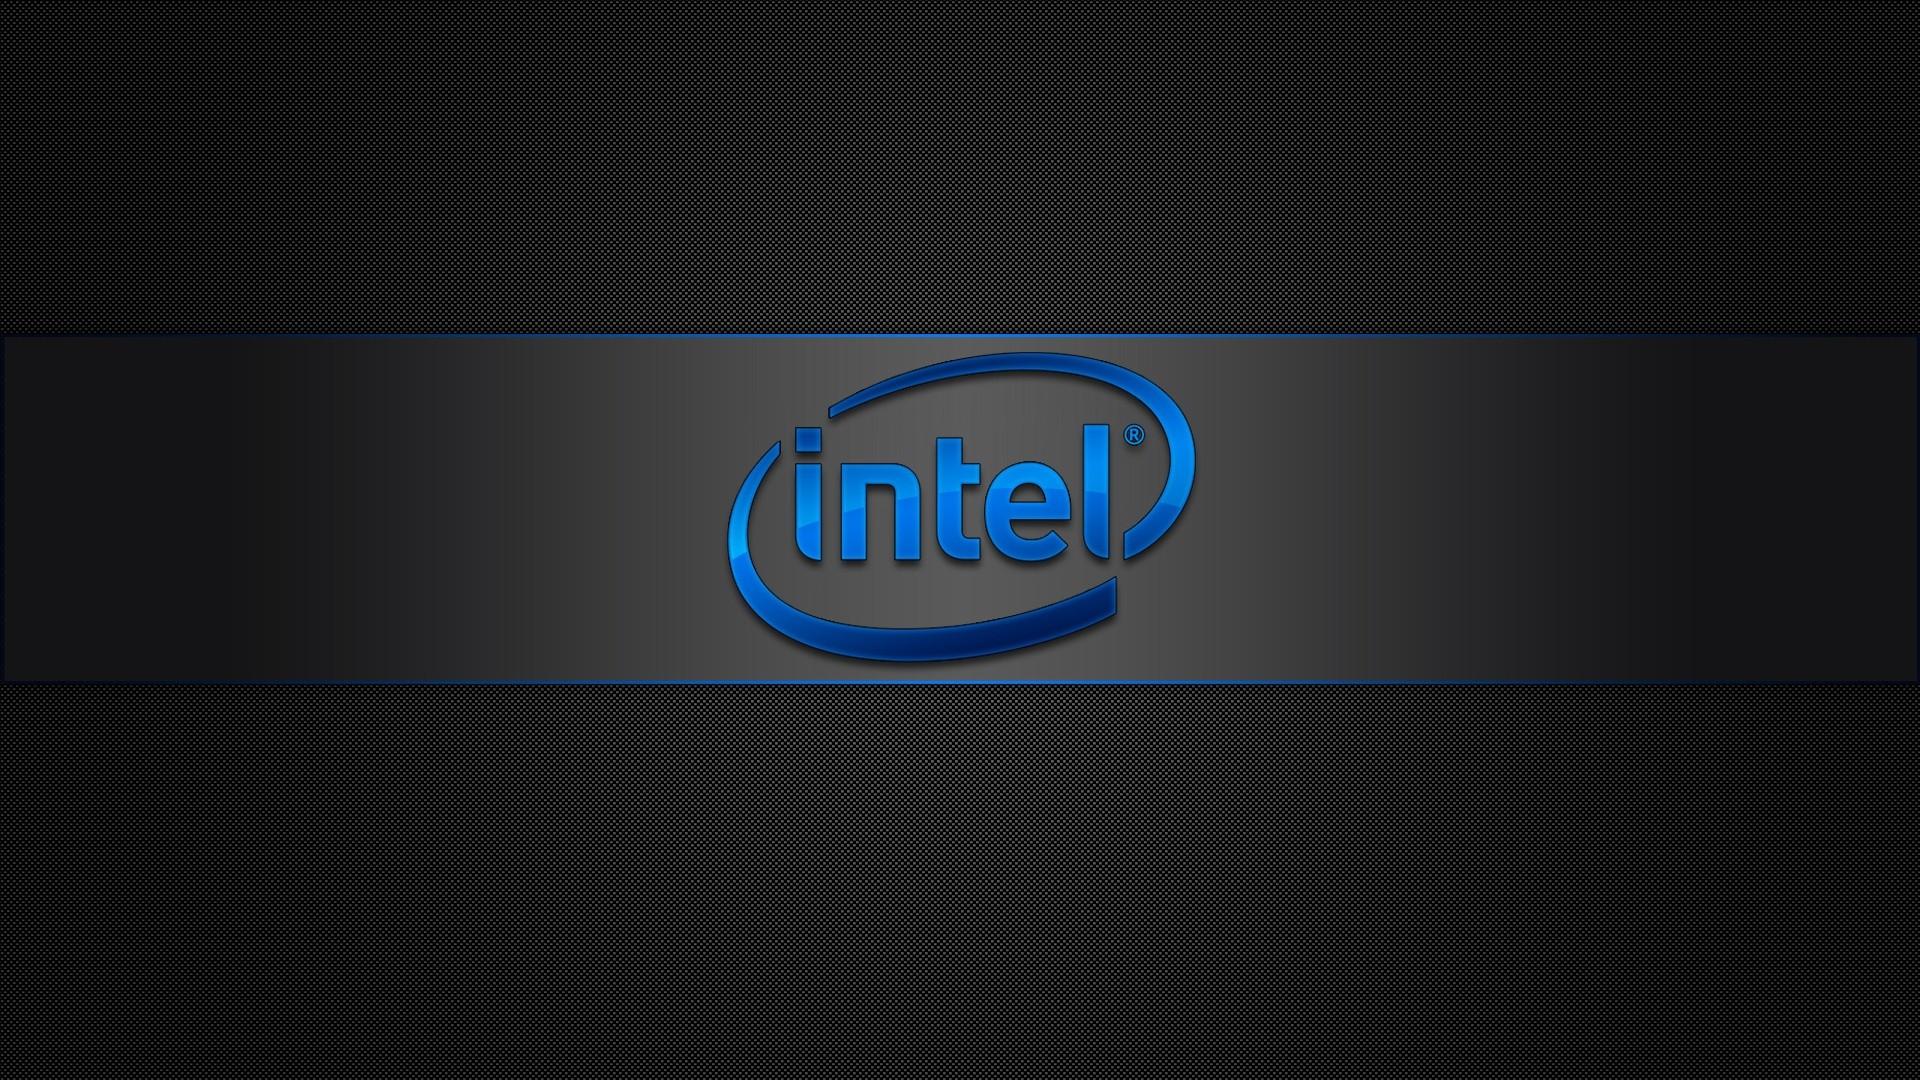 Intel Wallpaper For Pc